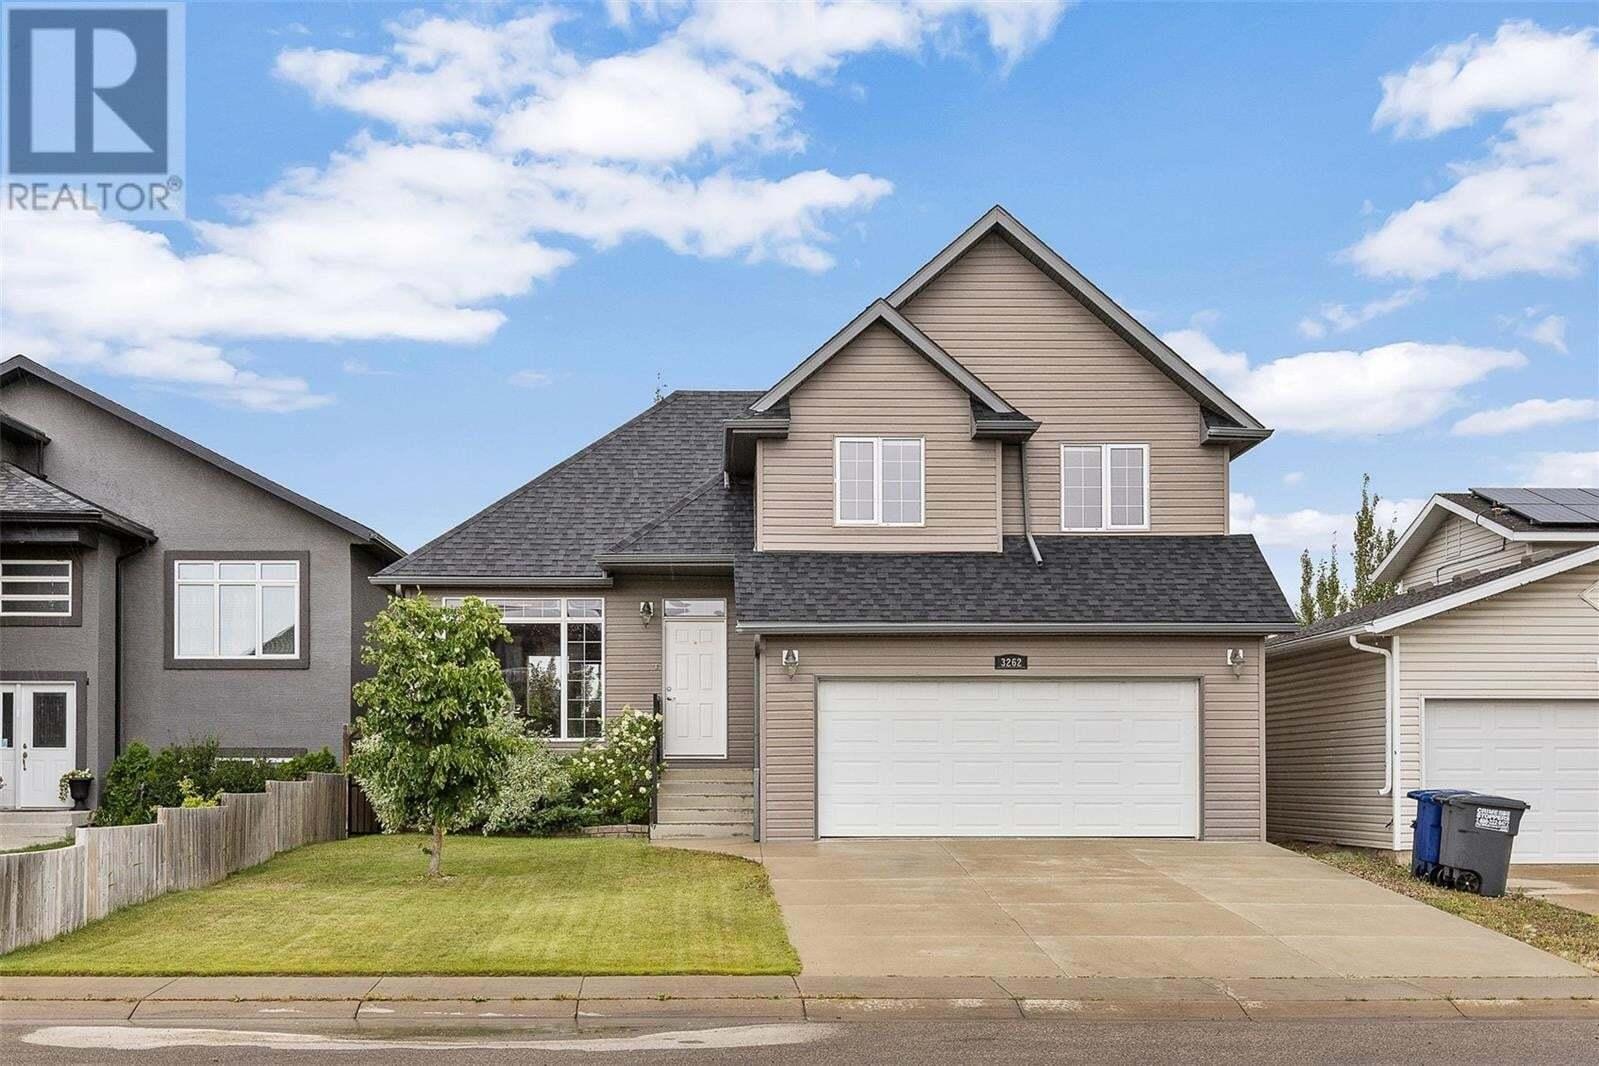 House for sale at 3262 Mcclocklin Rd Saskatoon Saskatchewan - MLS: SK821130